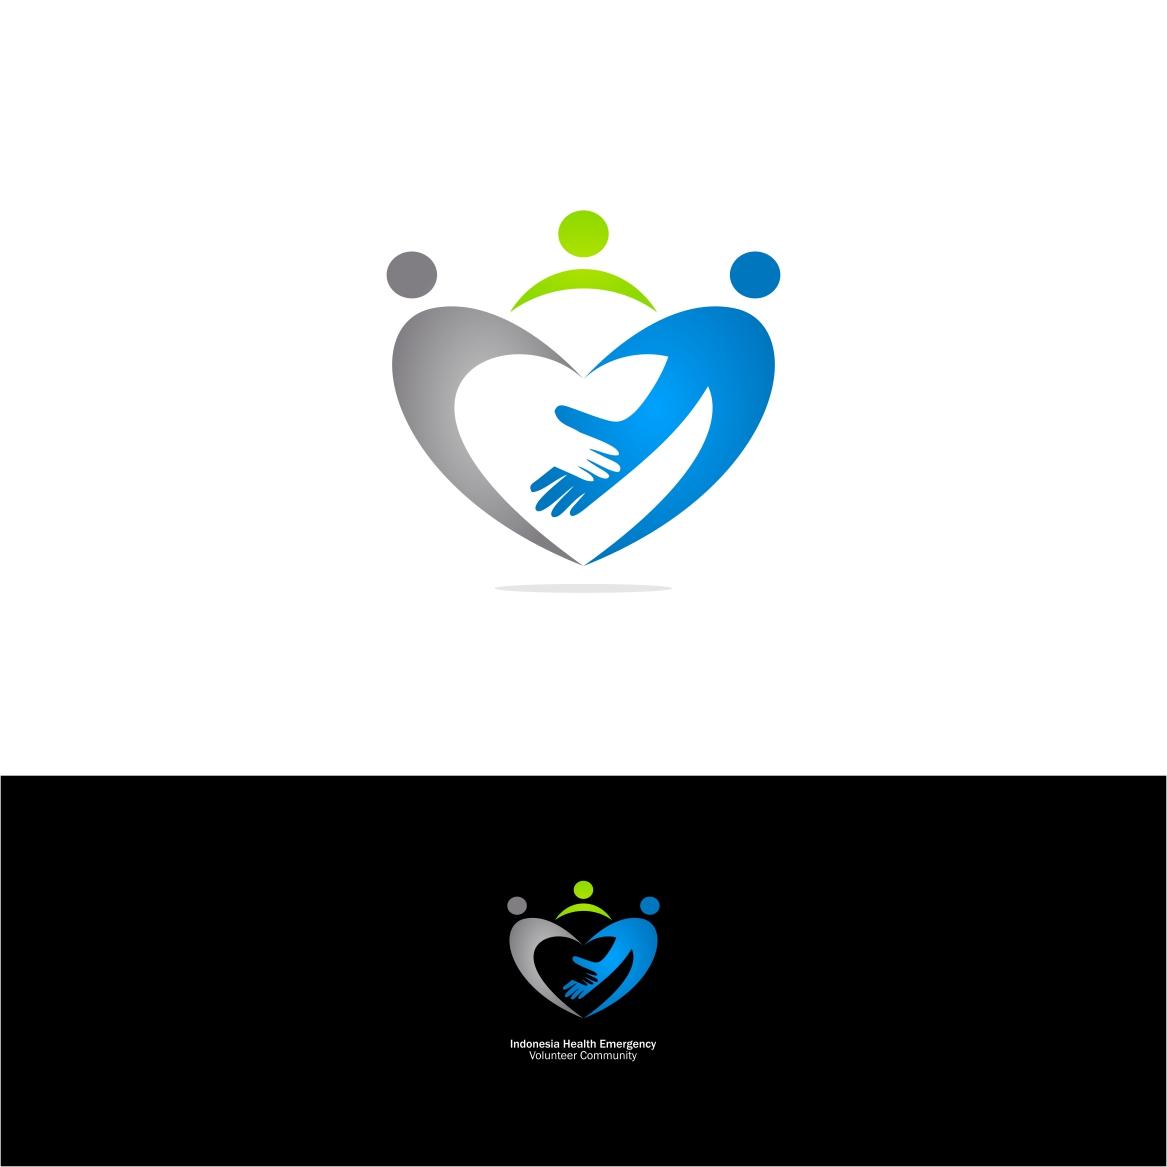 Desain Logo Organisasi Relawan Emergensi Kesehatan Indonesia